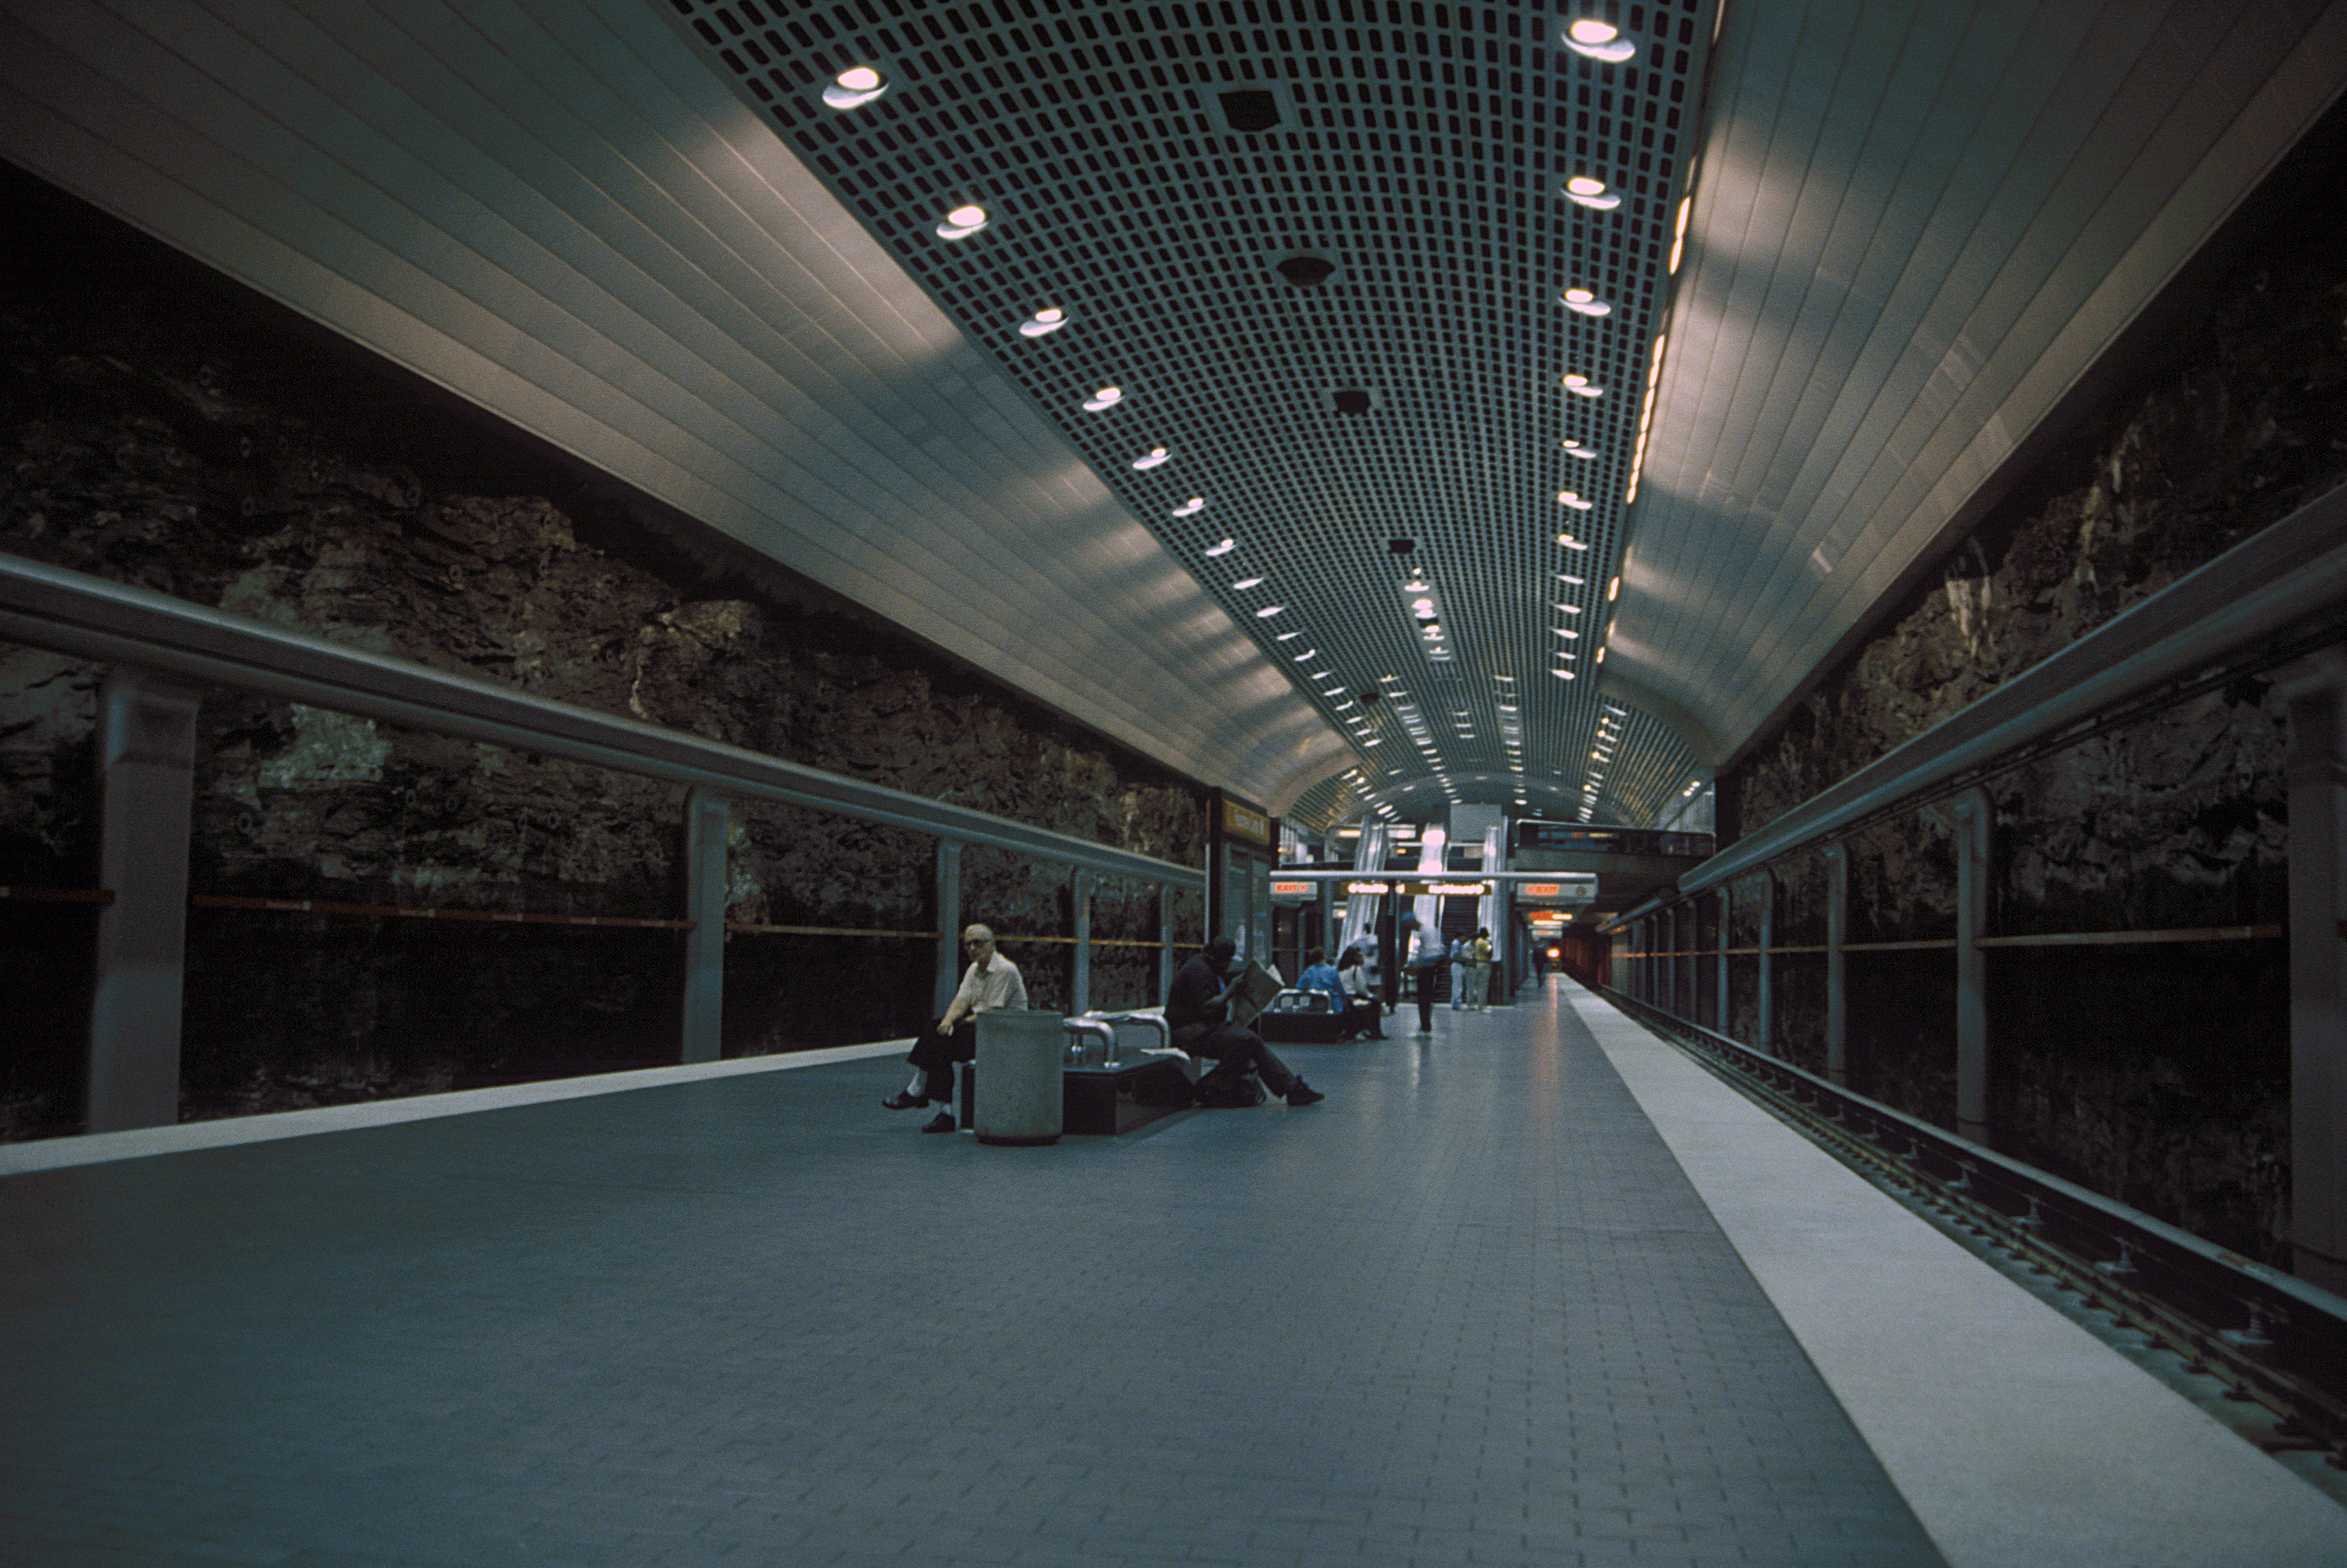 A Guide To Riding Marta Trains In Atlanta